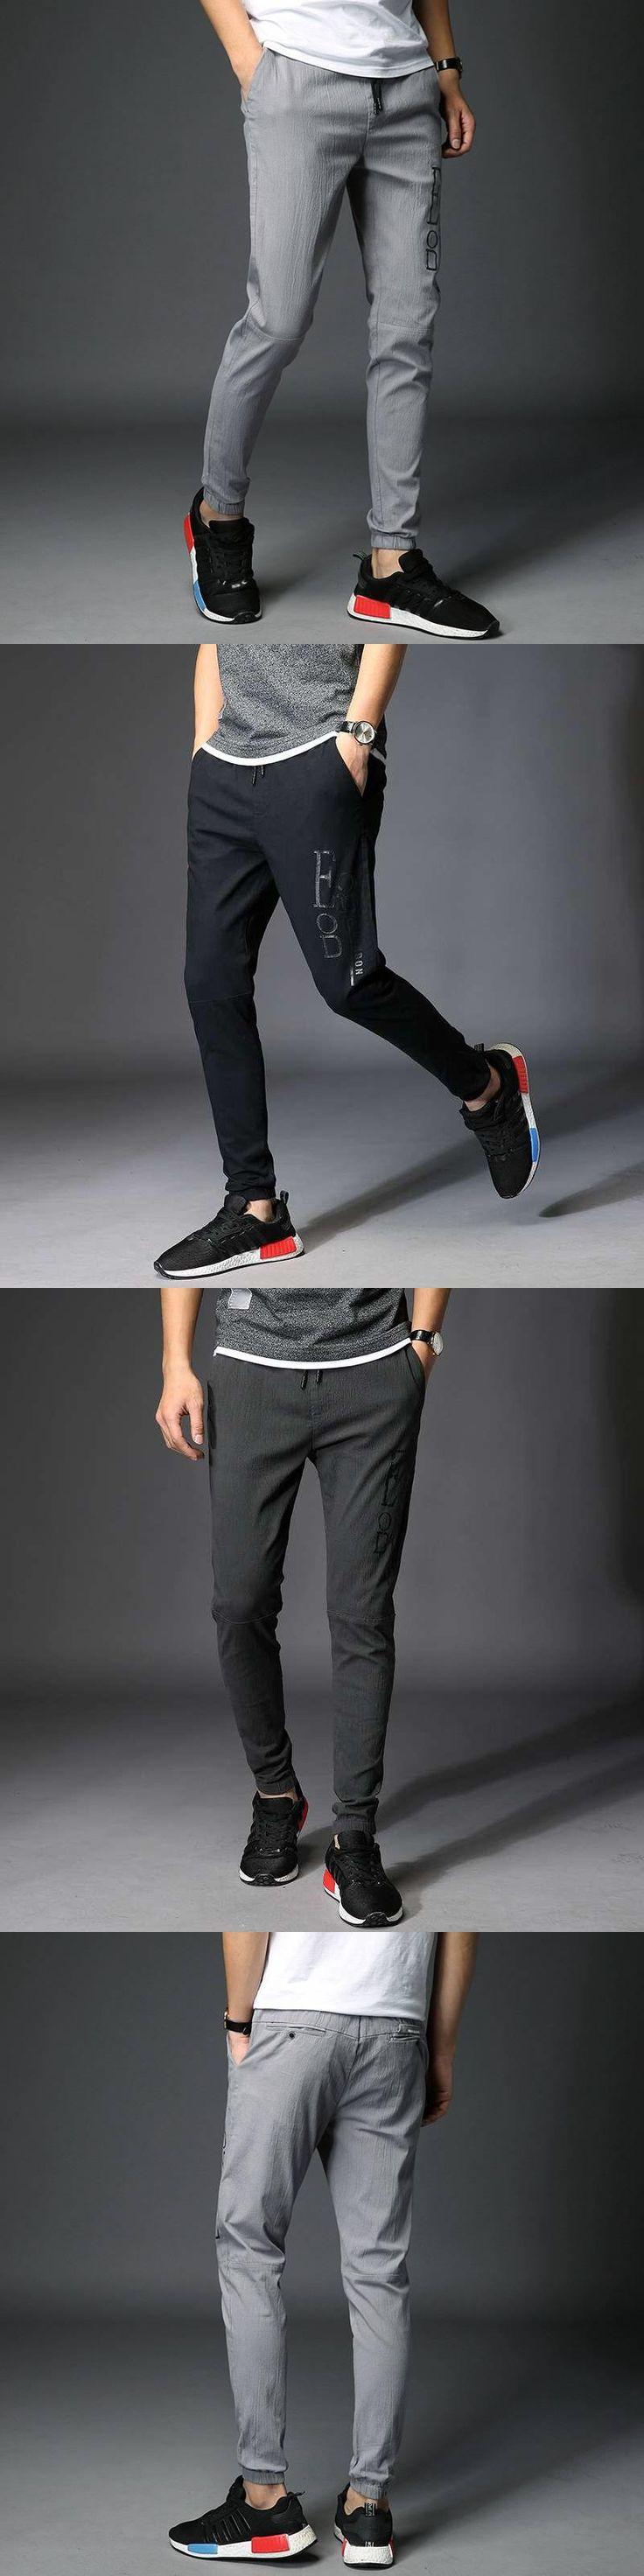 #1516 Harem pants men Elastic waist trousers Track pants Lightweight Spring summer Joggers Slim trousers men Pantalon hombre